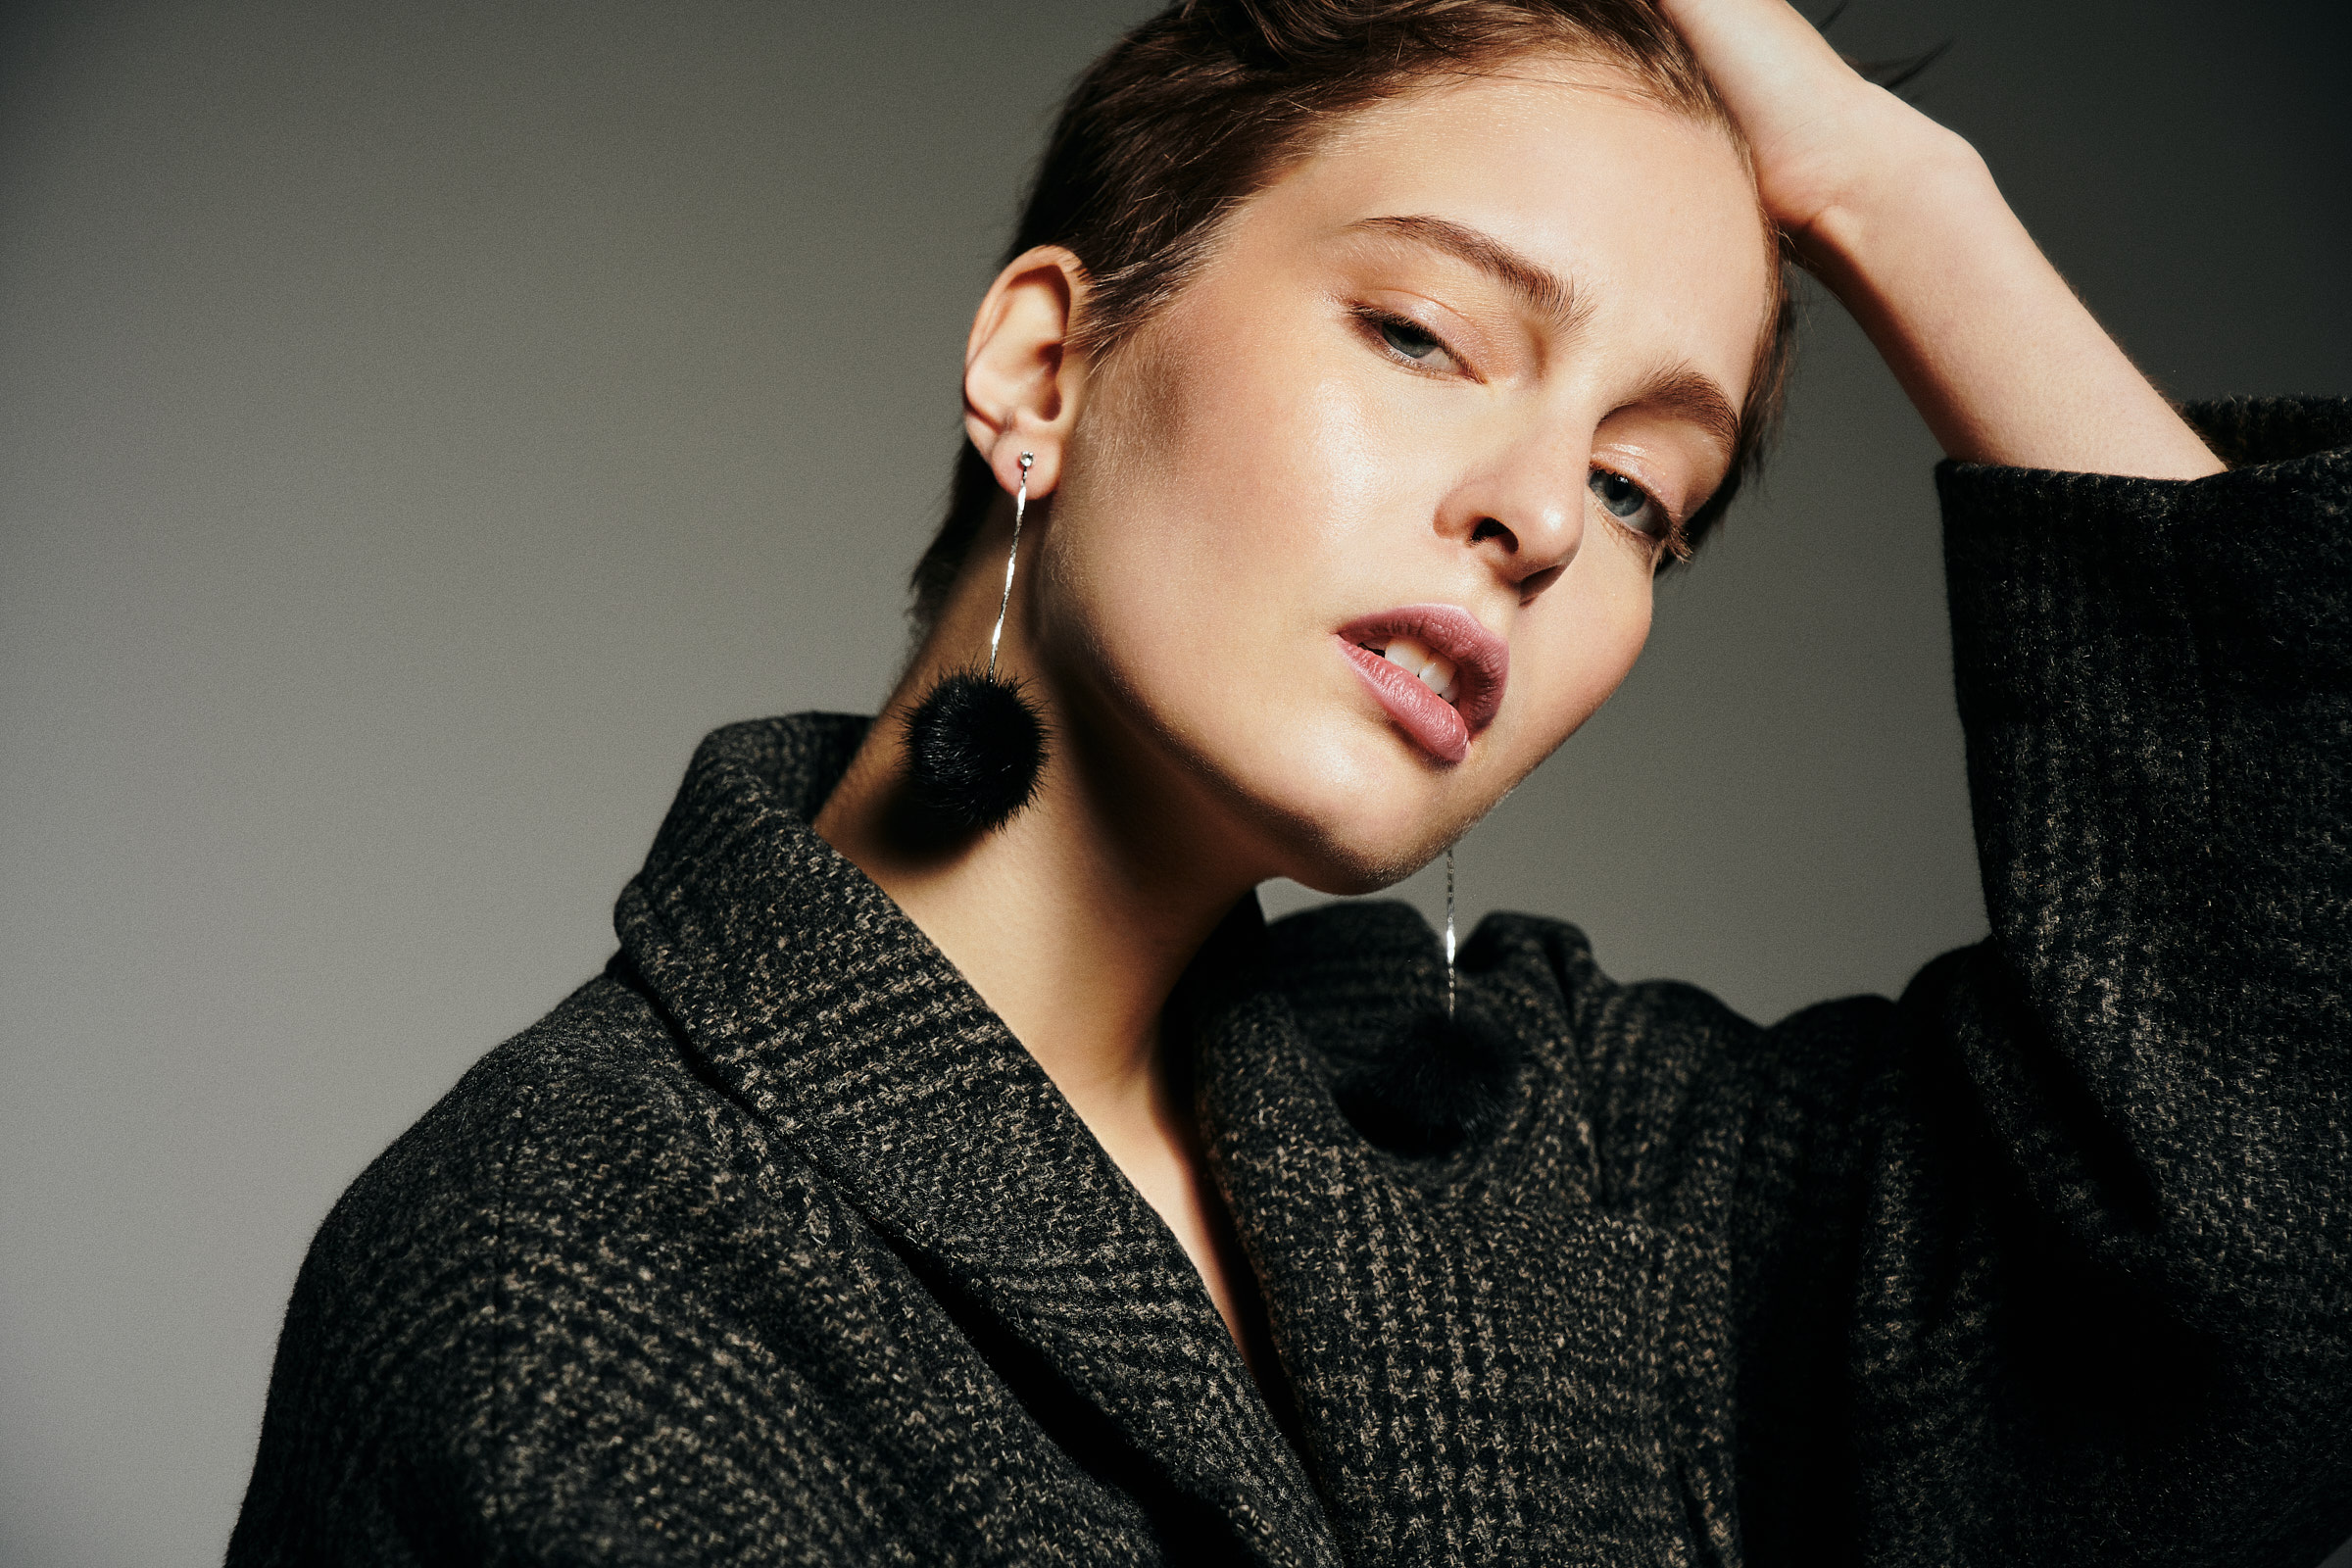 Jacket: ALLSAINTS Earrings: Vintage